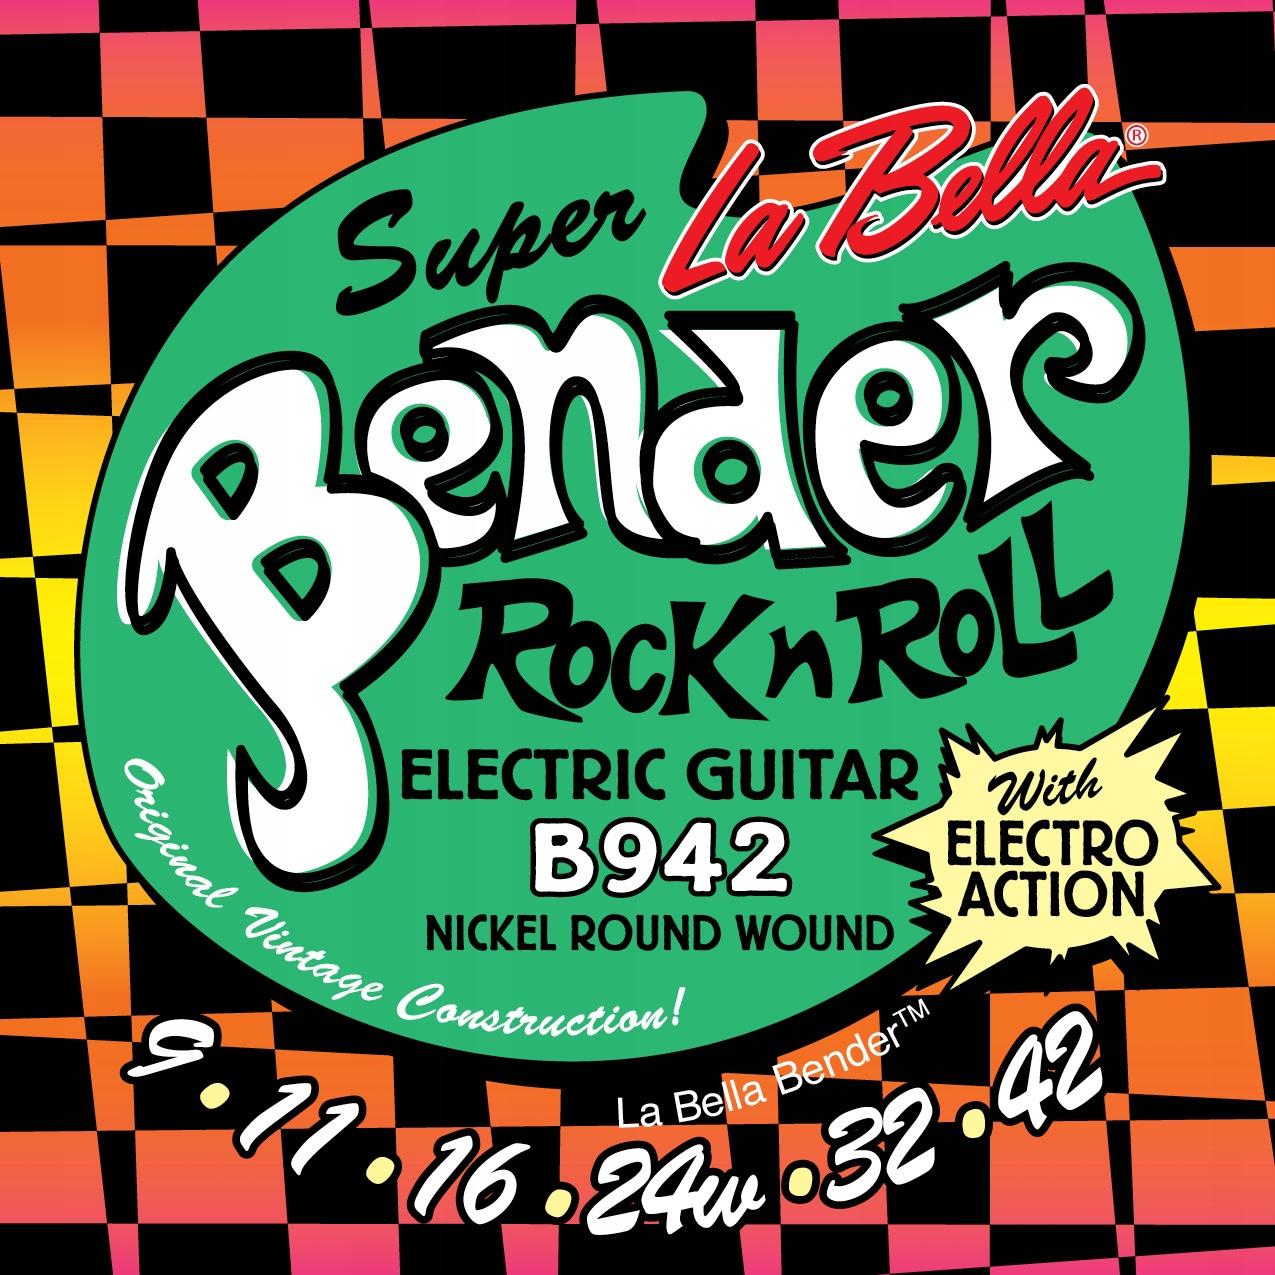 Struny do gitary elektrycznej LA Bella Bender 9-42